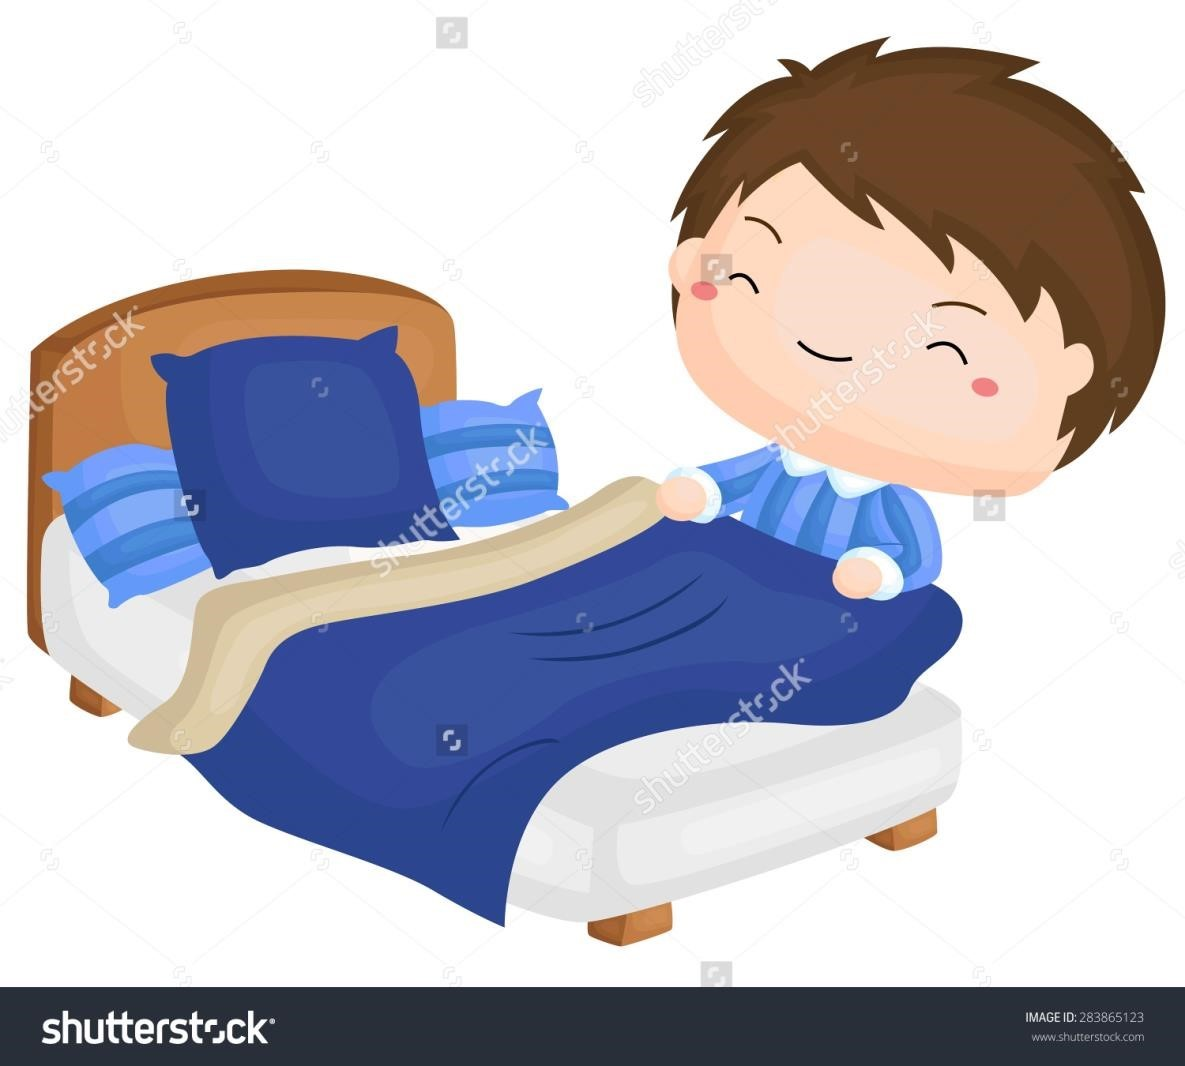 Blanket clipart warm blanket Art Blanket Kid Picnic Bed